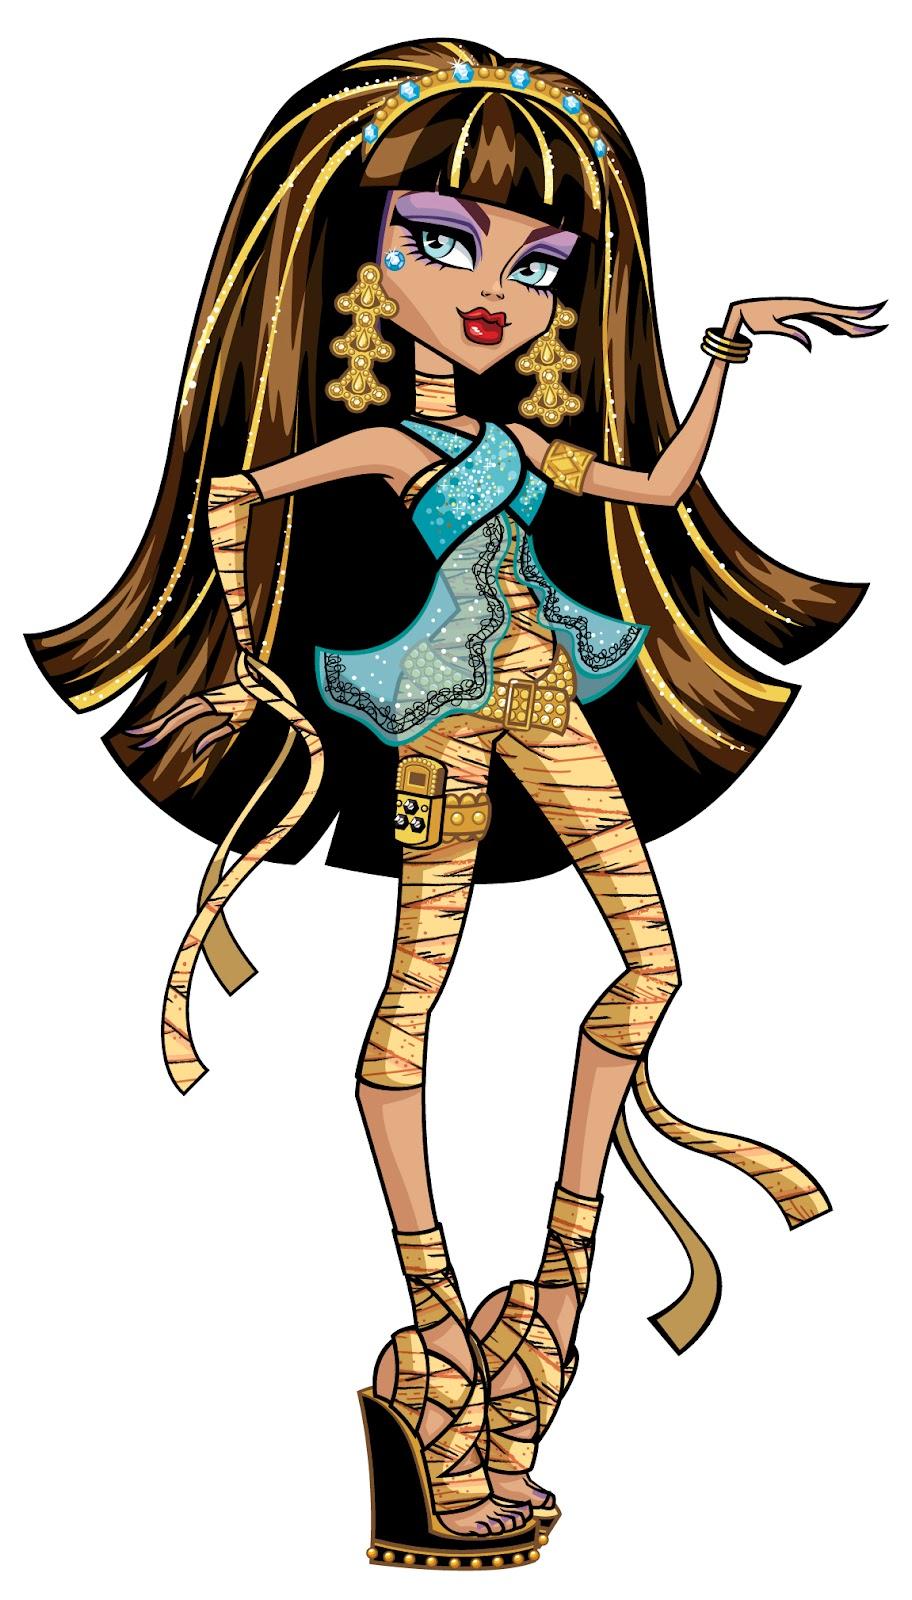 Uncategorized Cleo De Nile cleo de nile the secret world of animated characters wiki nile